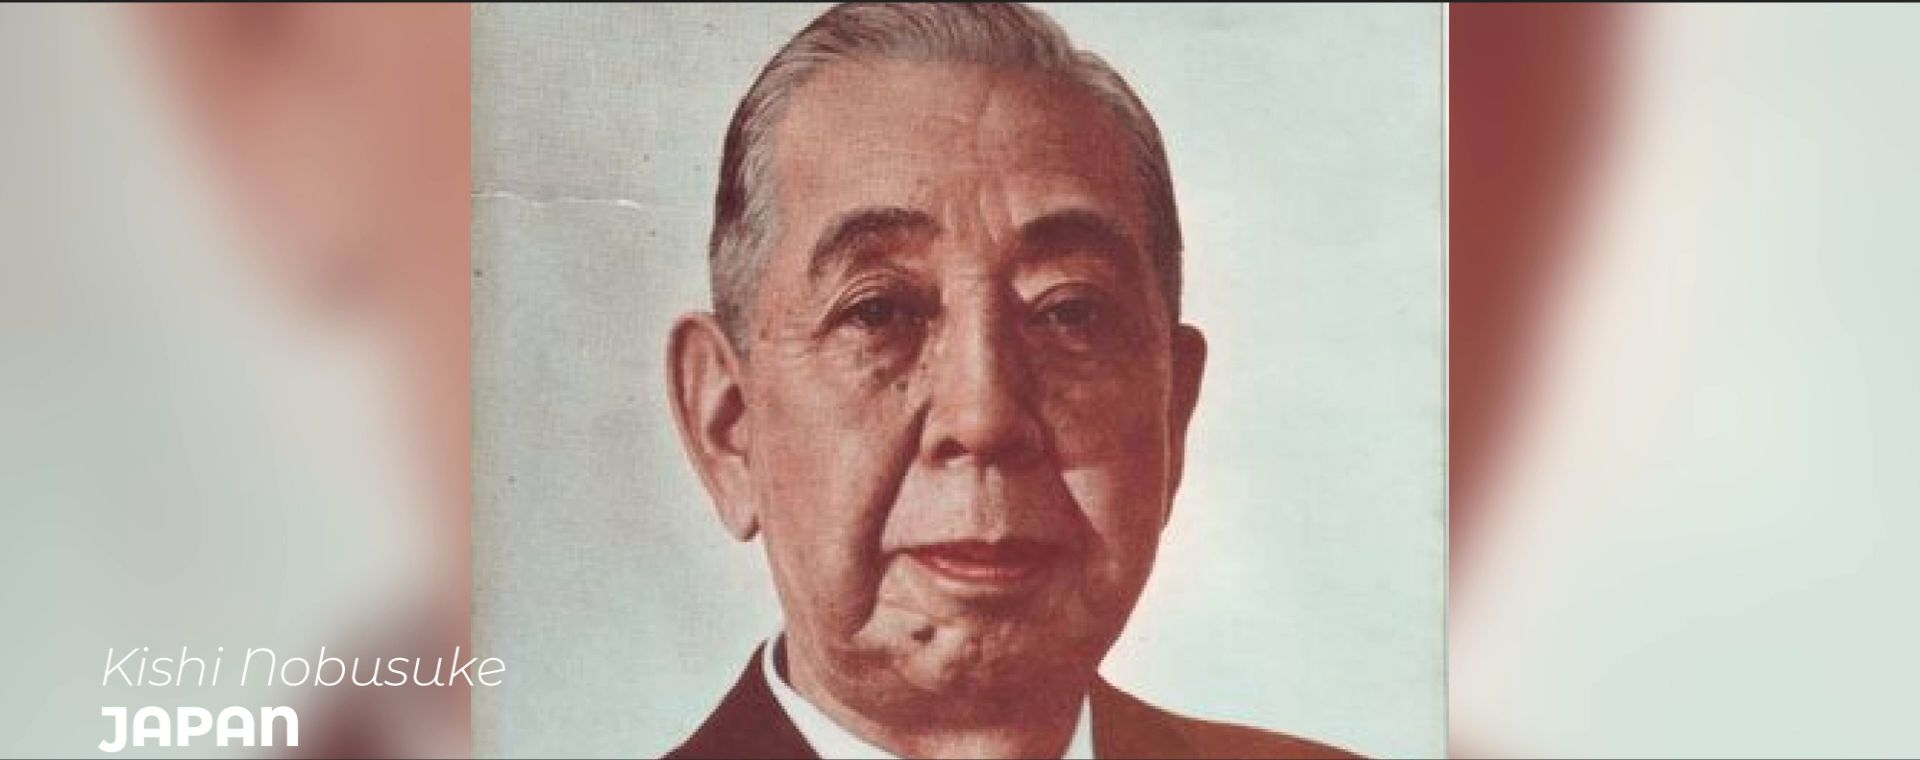 KISHI NOBUSUKE